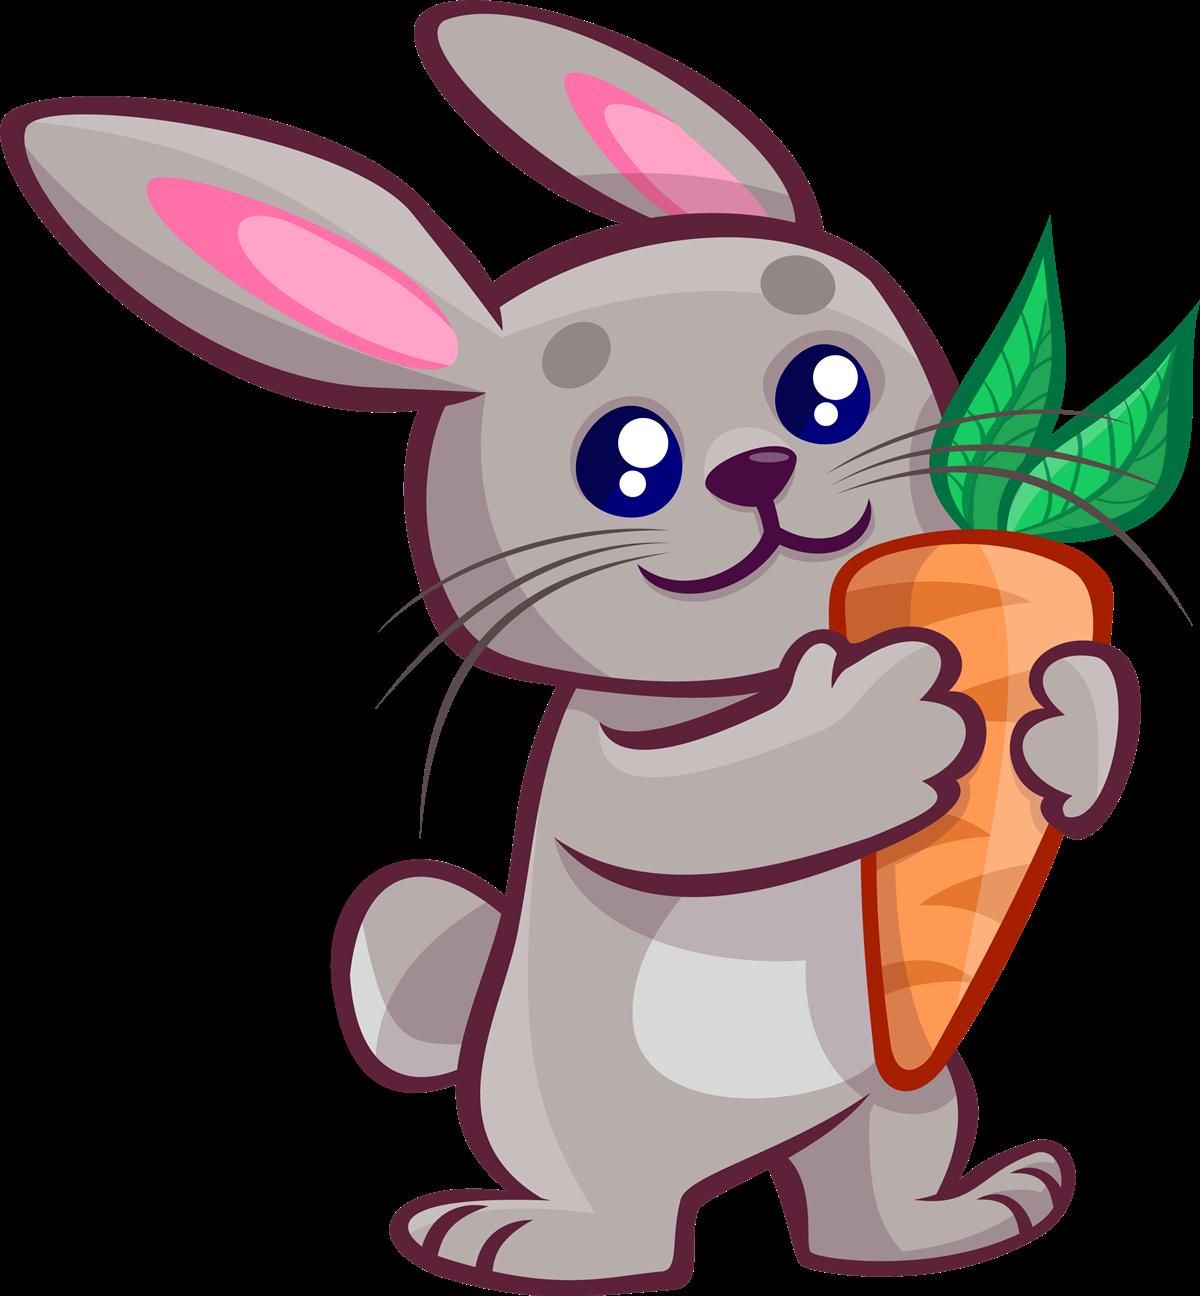 Free public domain vintage rabbit easter images clipart svg freeuse Cartoon Rabbit Image | Free download best Cartoon Rabbit Image on ... svg freeuse